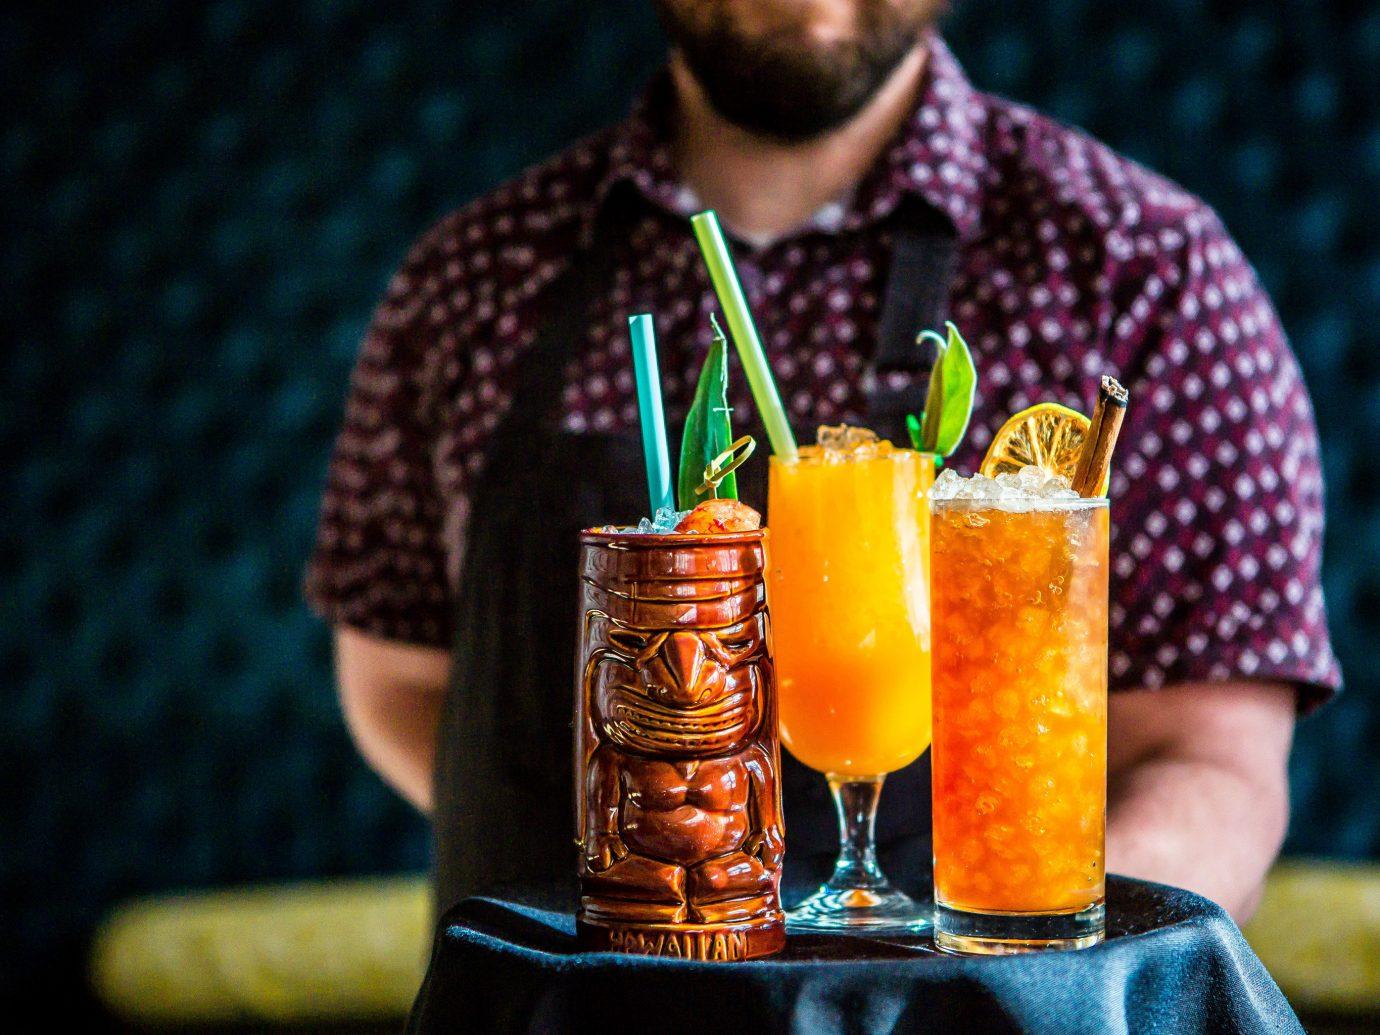 Trip Ideas person food Drink sense beverage